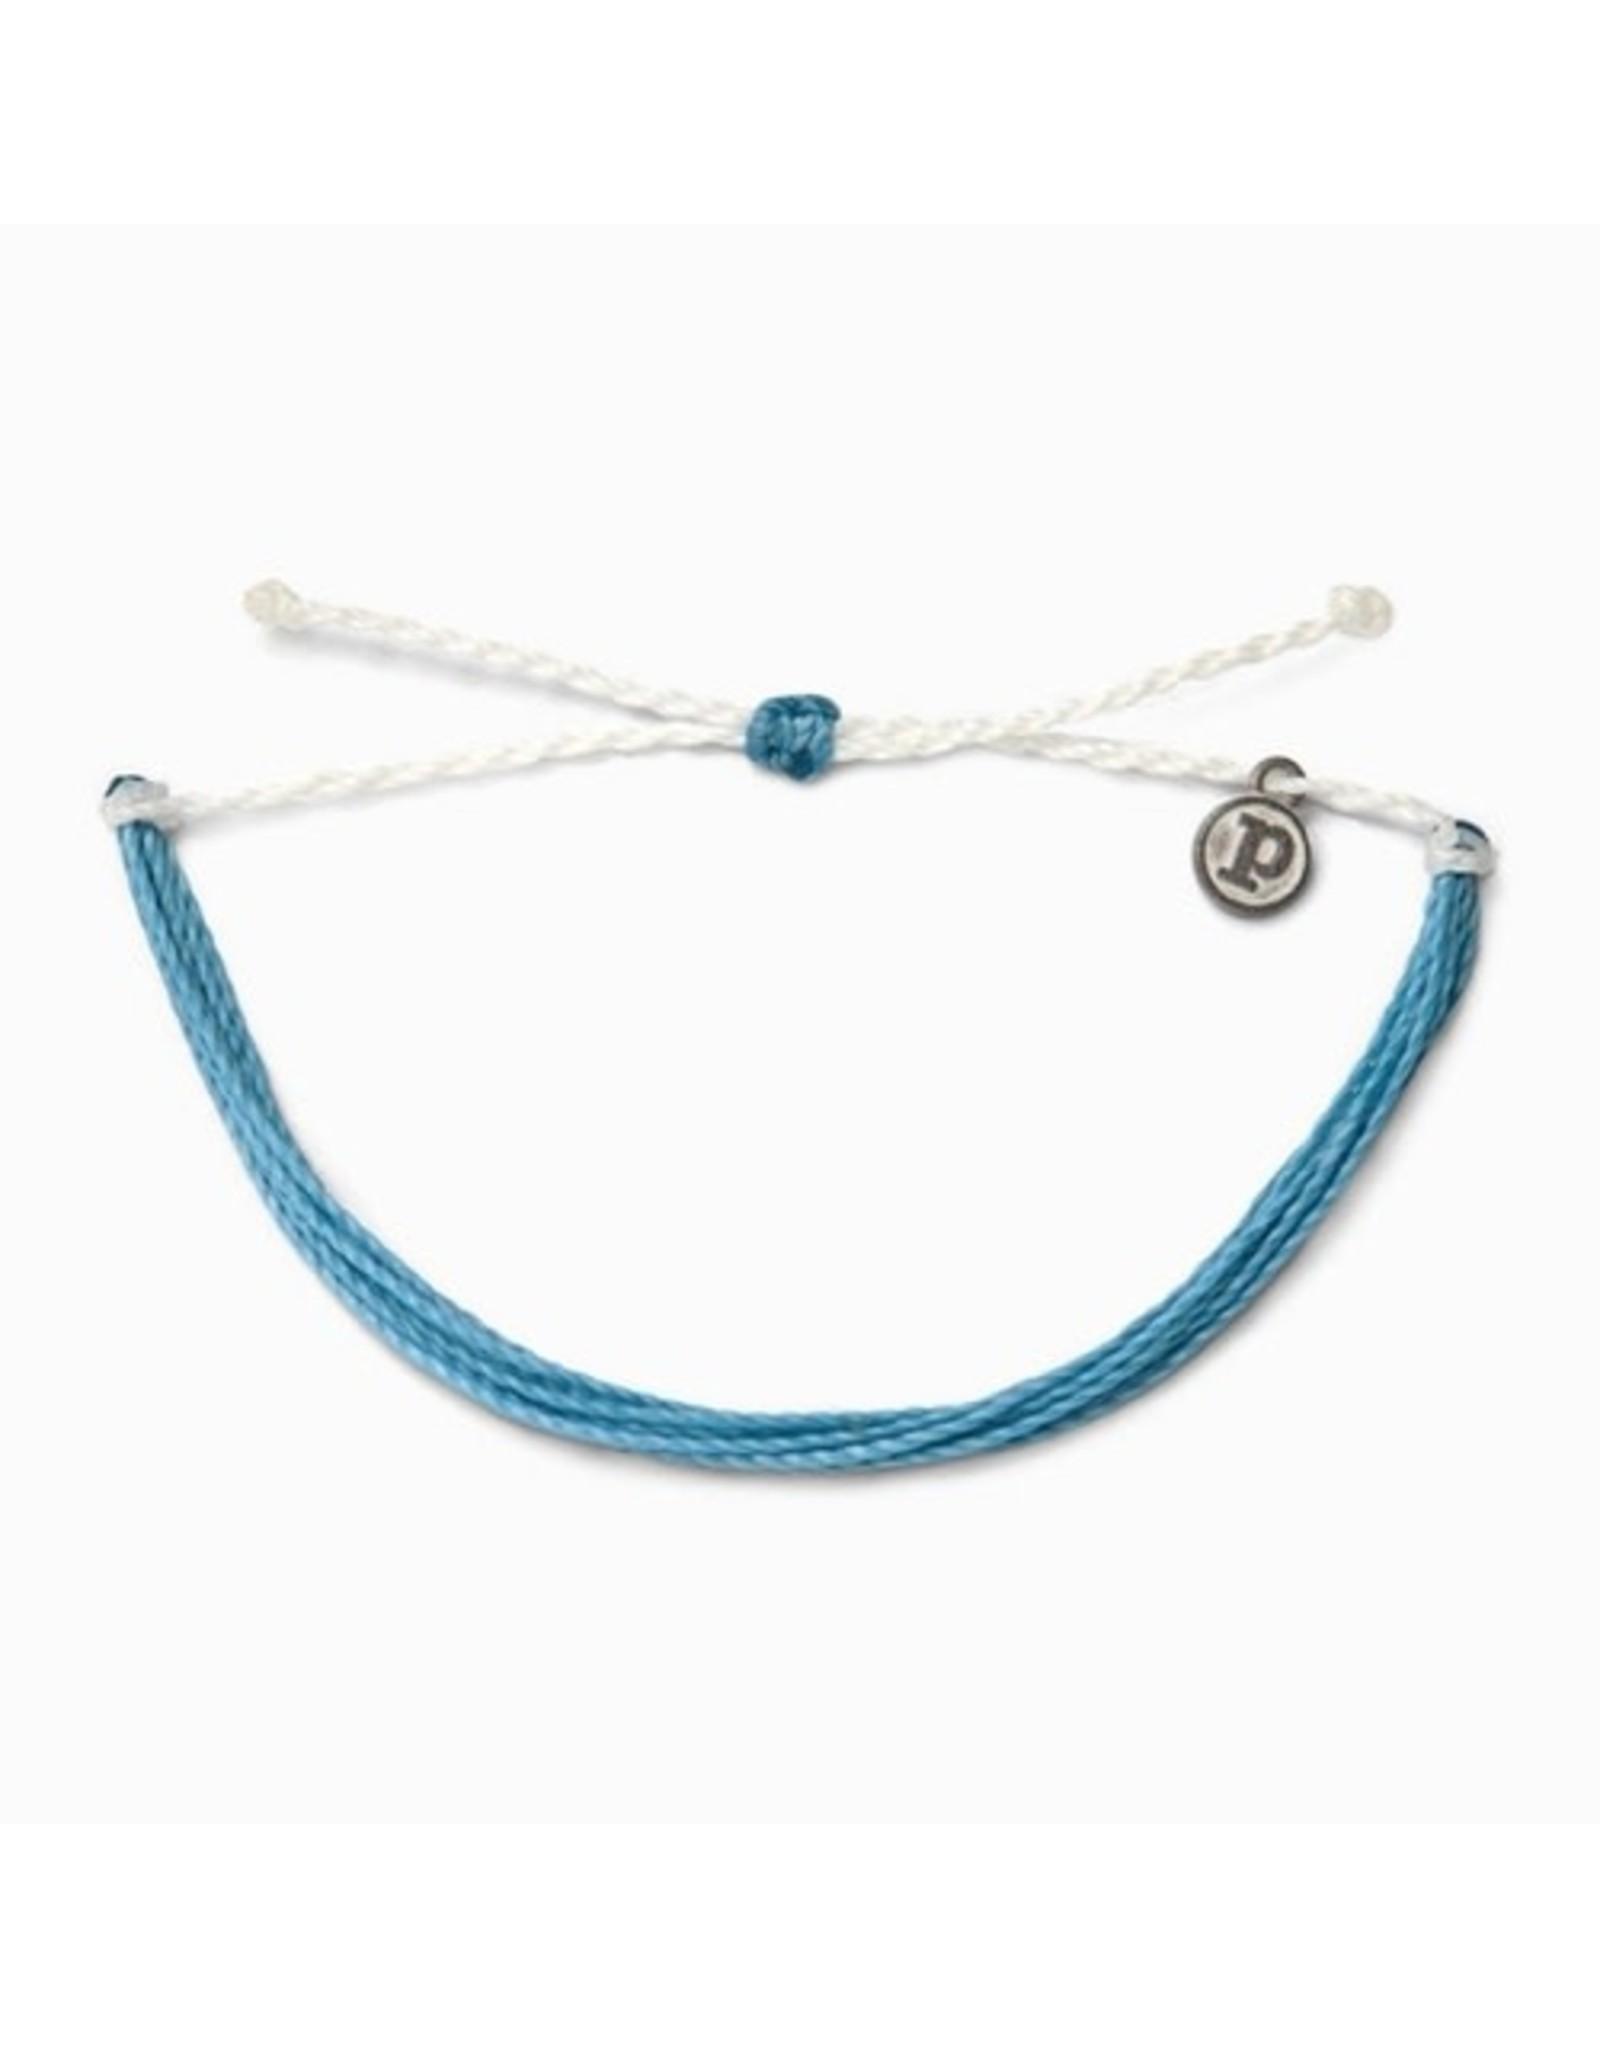 Puravida Bracelets Charity Original Anxiety Disorder